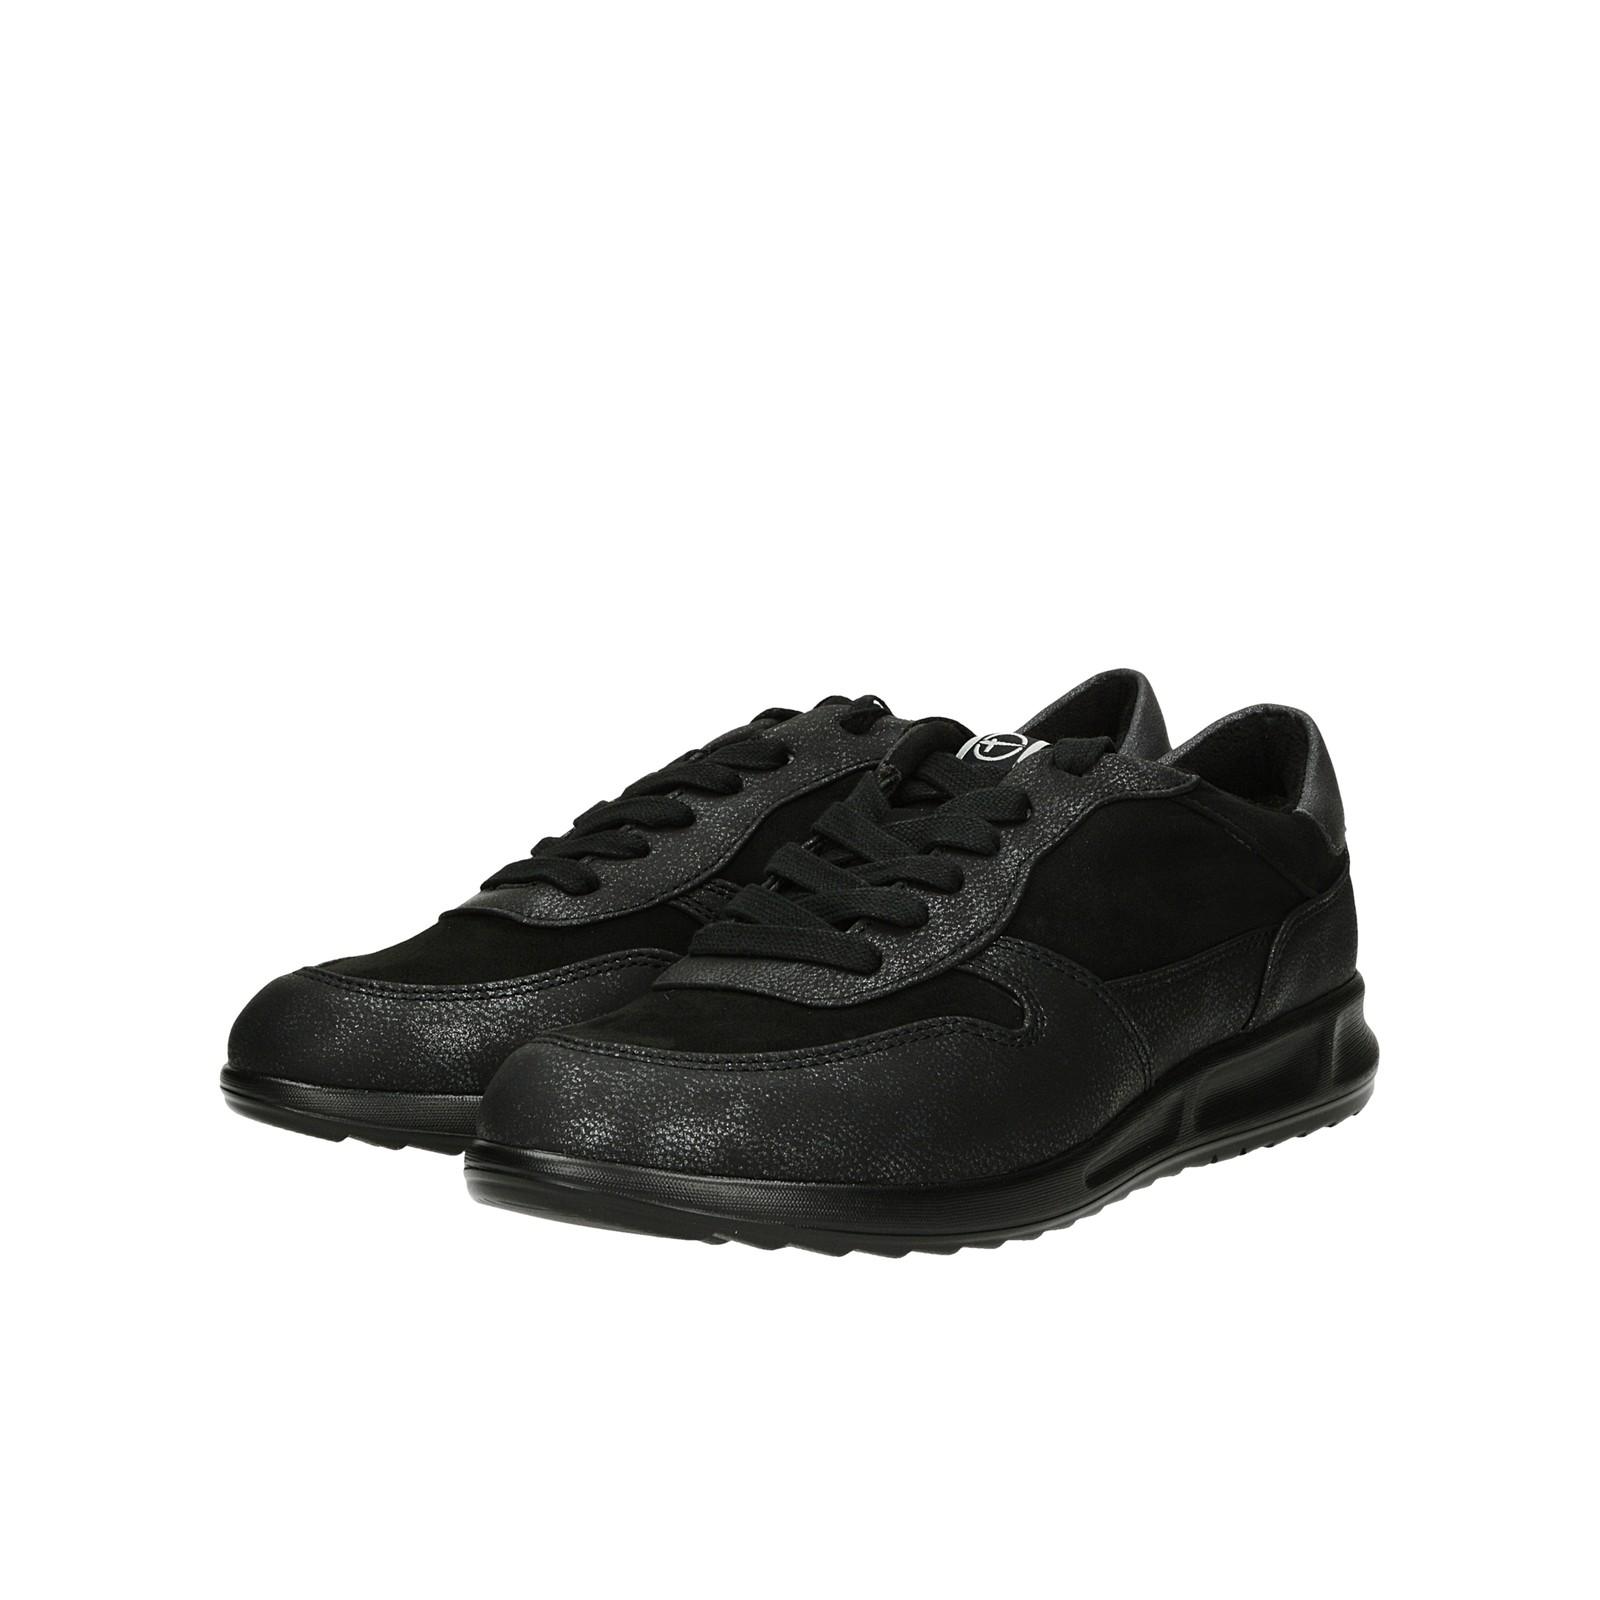 Tamaris dámske štýlové tenisky - čierne